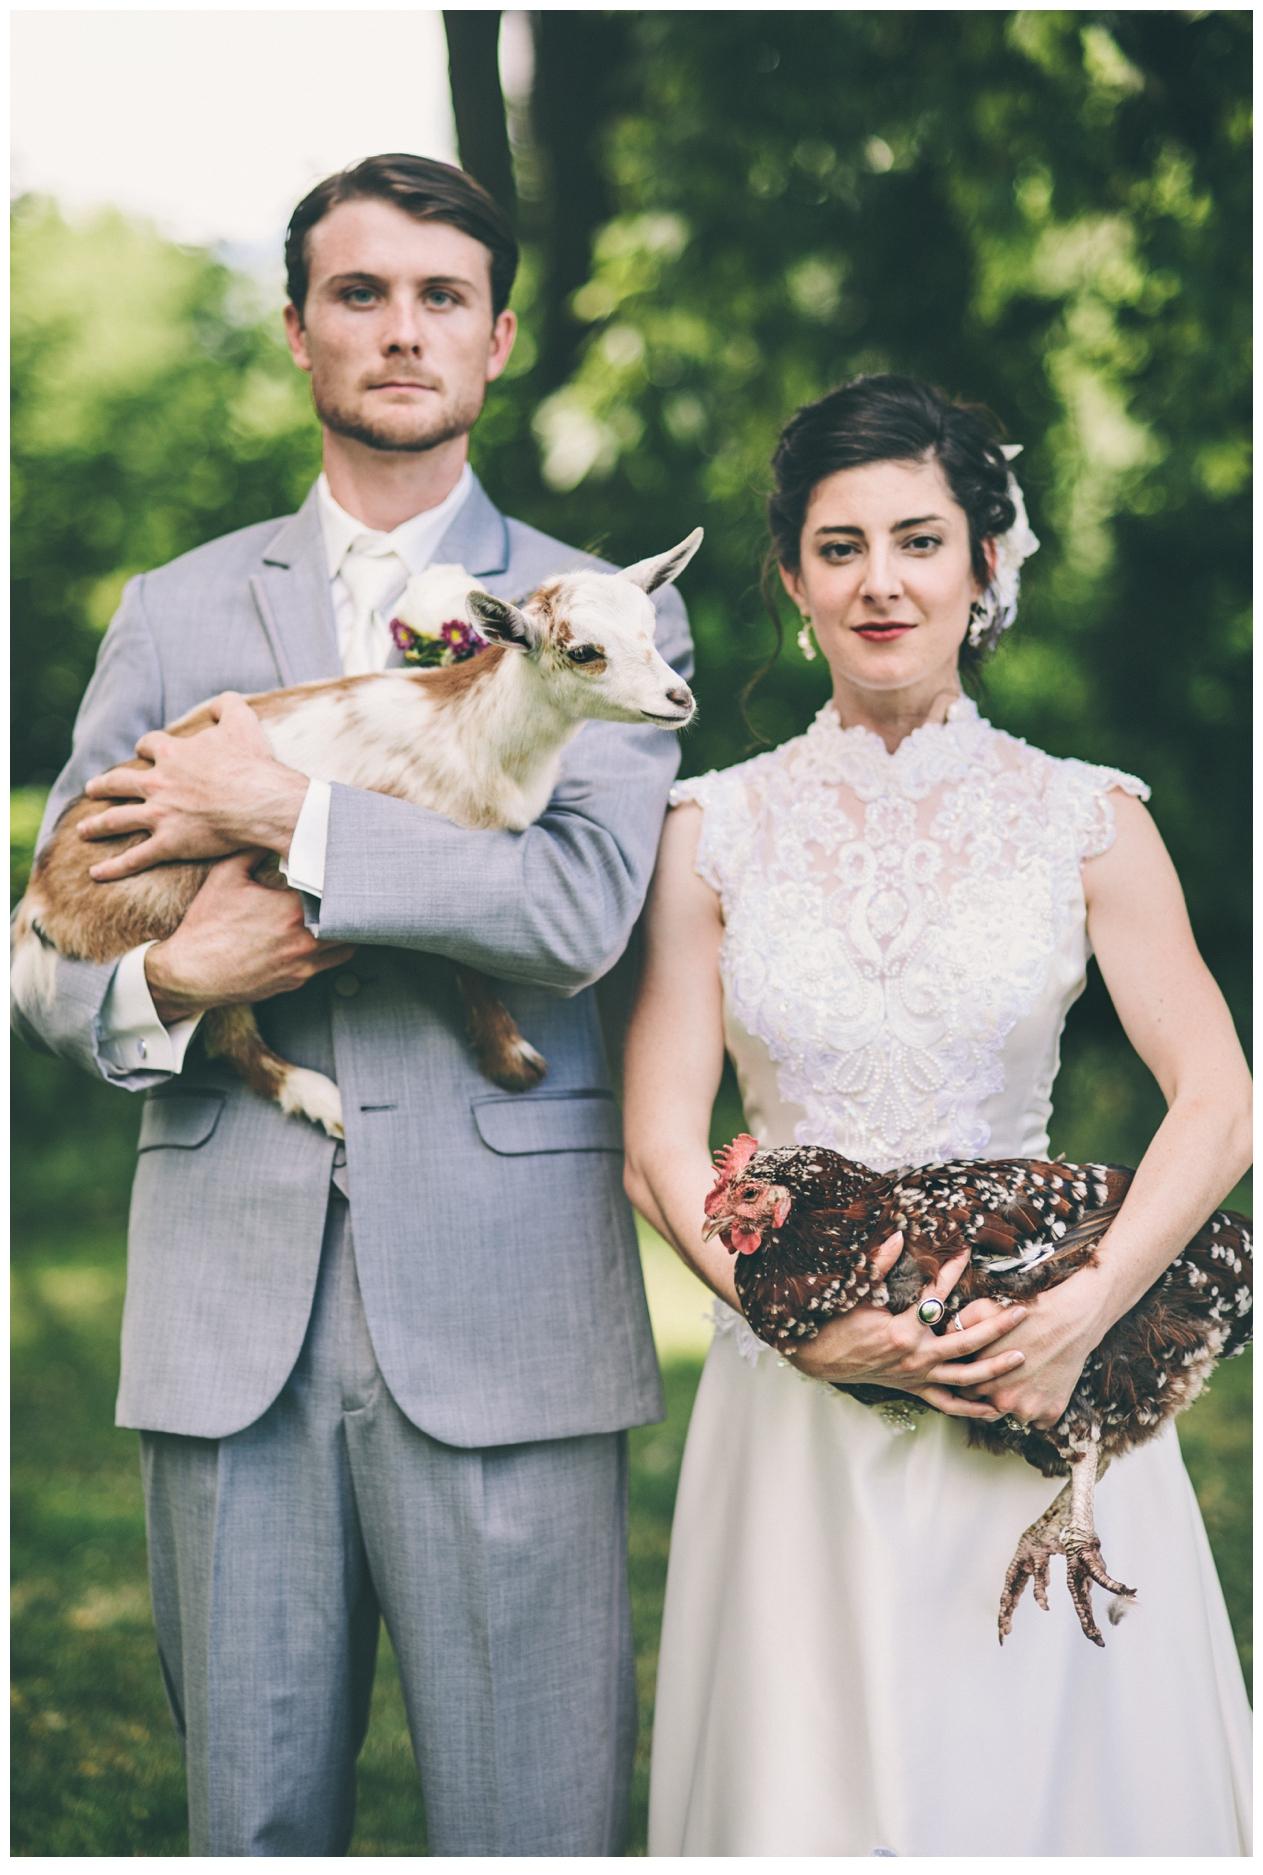 023-AmandaKoppImages-Colorado-Farm-Wedding-Photo.jpg